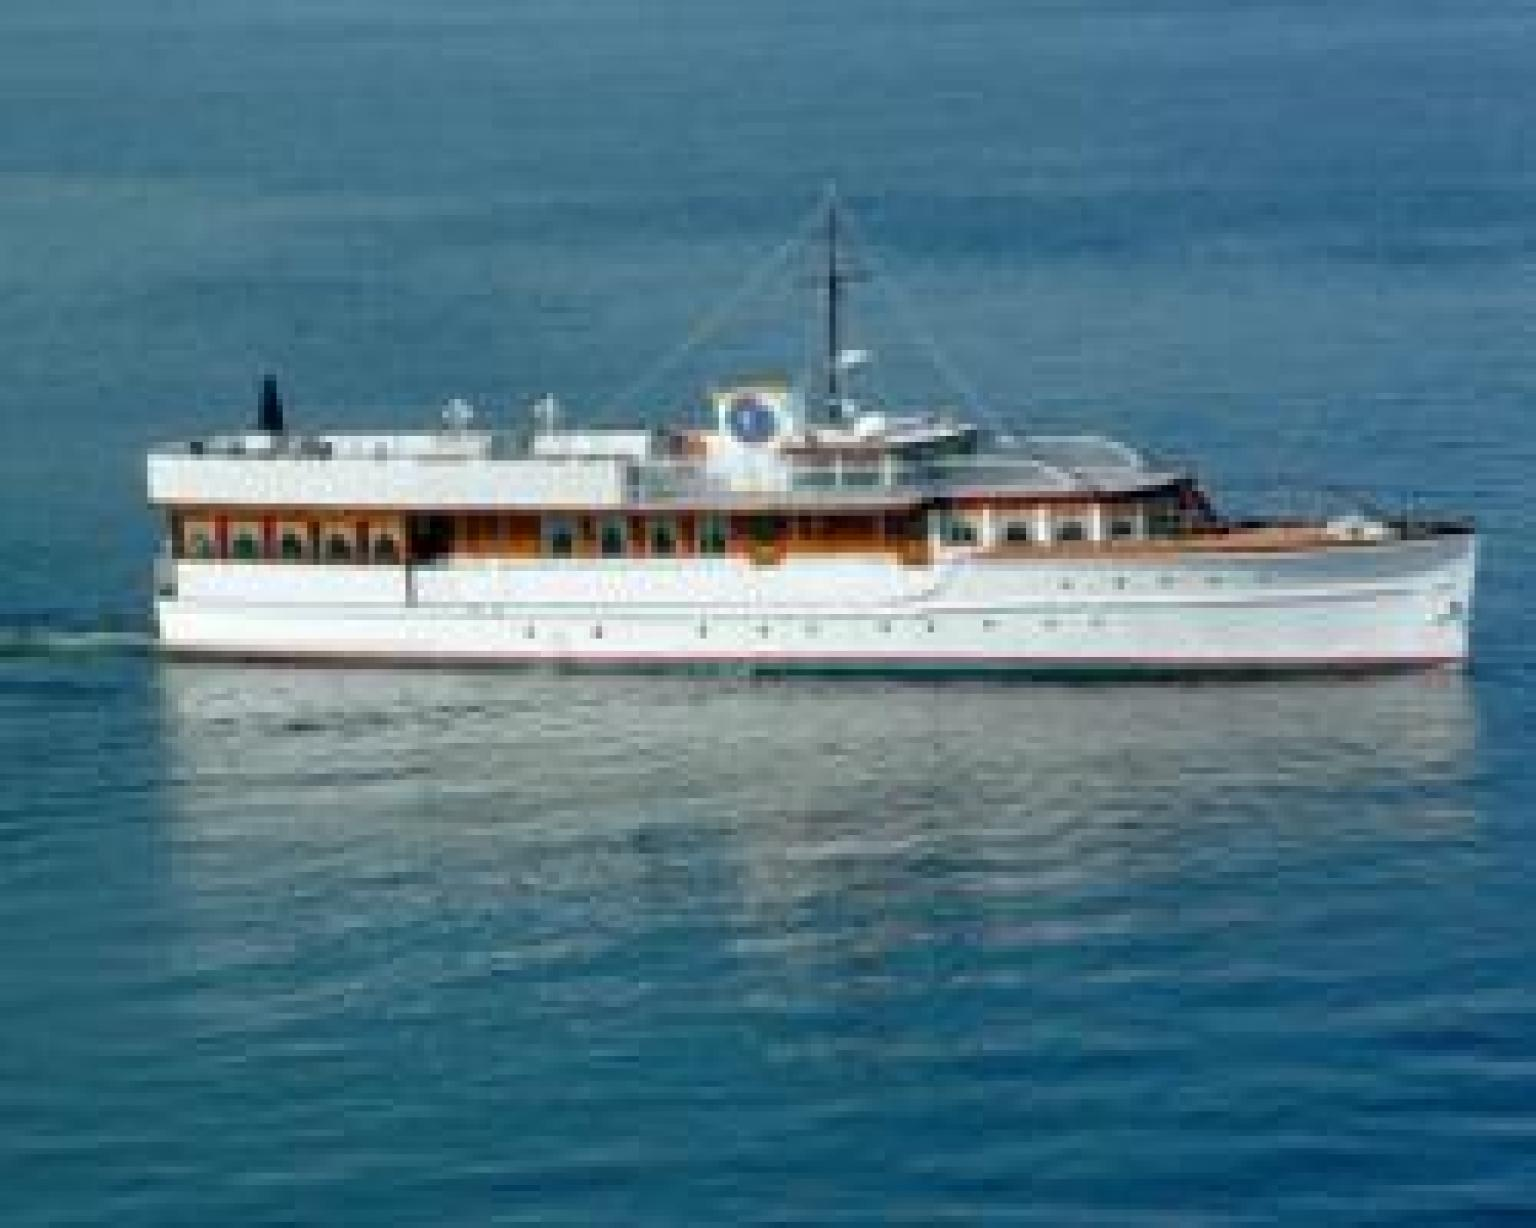 JFK Presidential Yacht Honey Fitz Hosts 1000 A Head